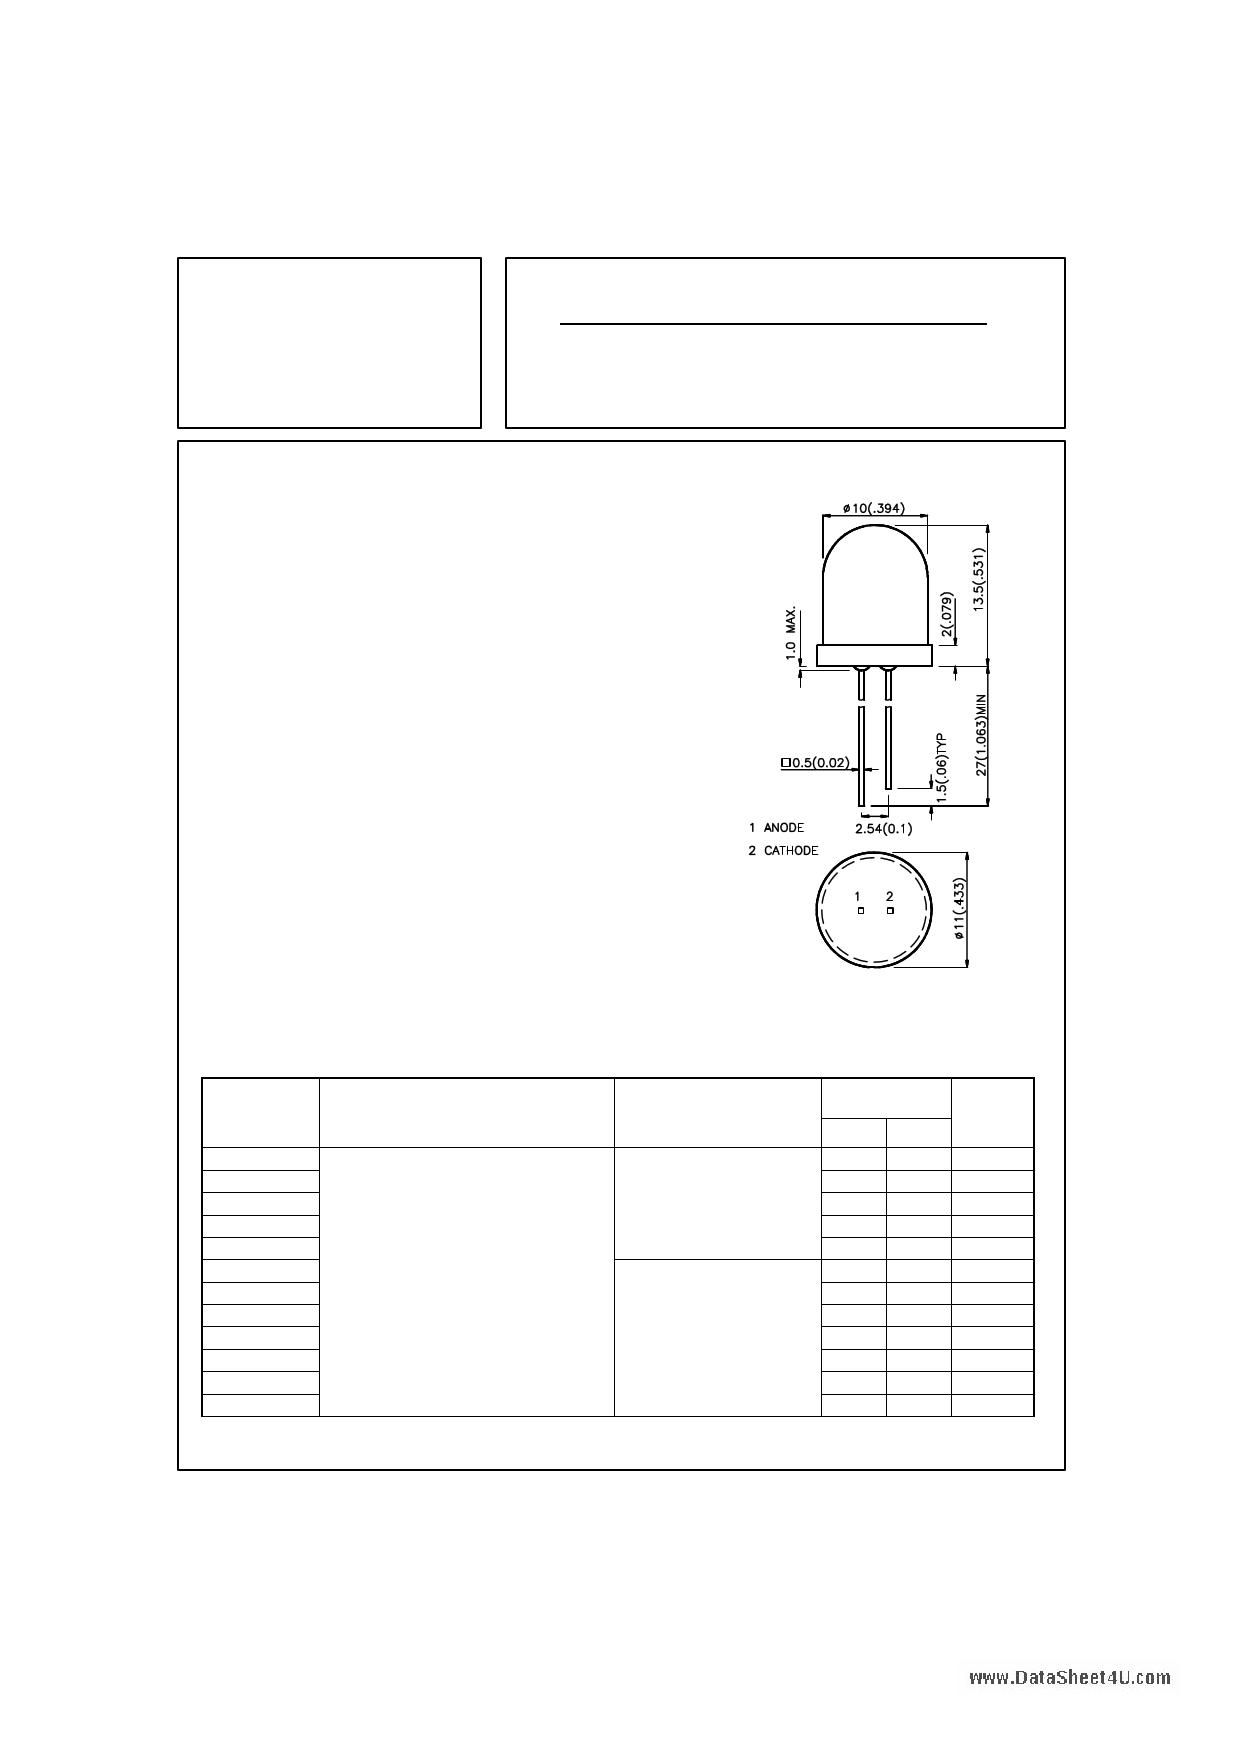 L-813SRD-C datasheet